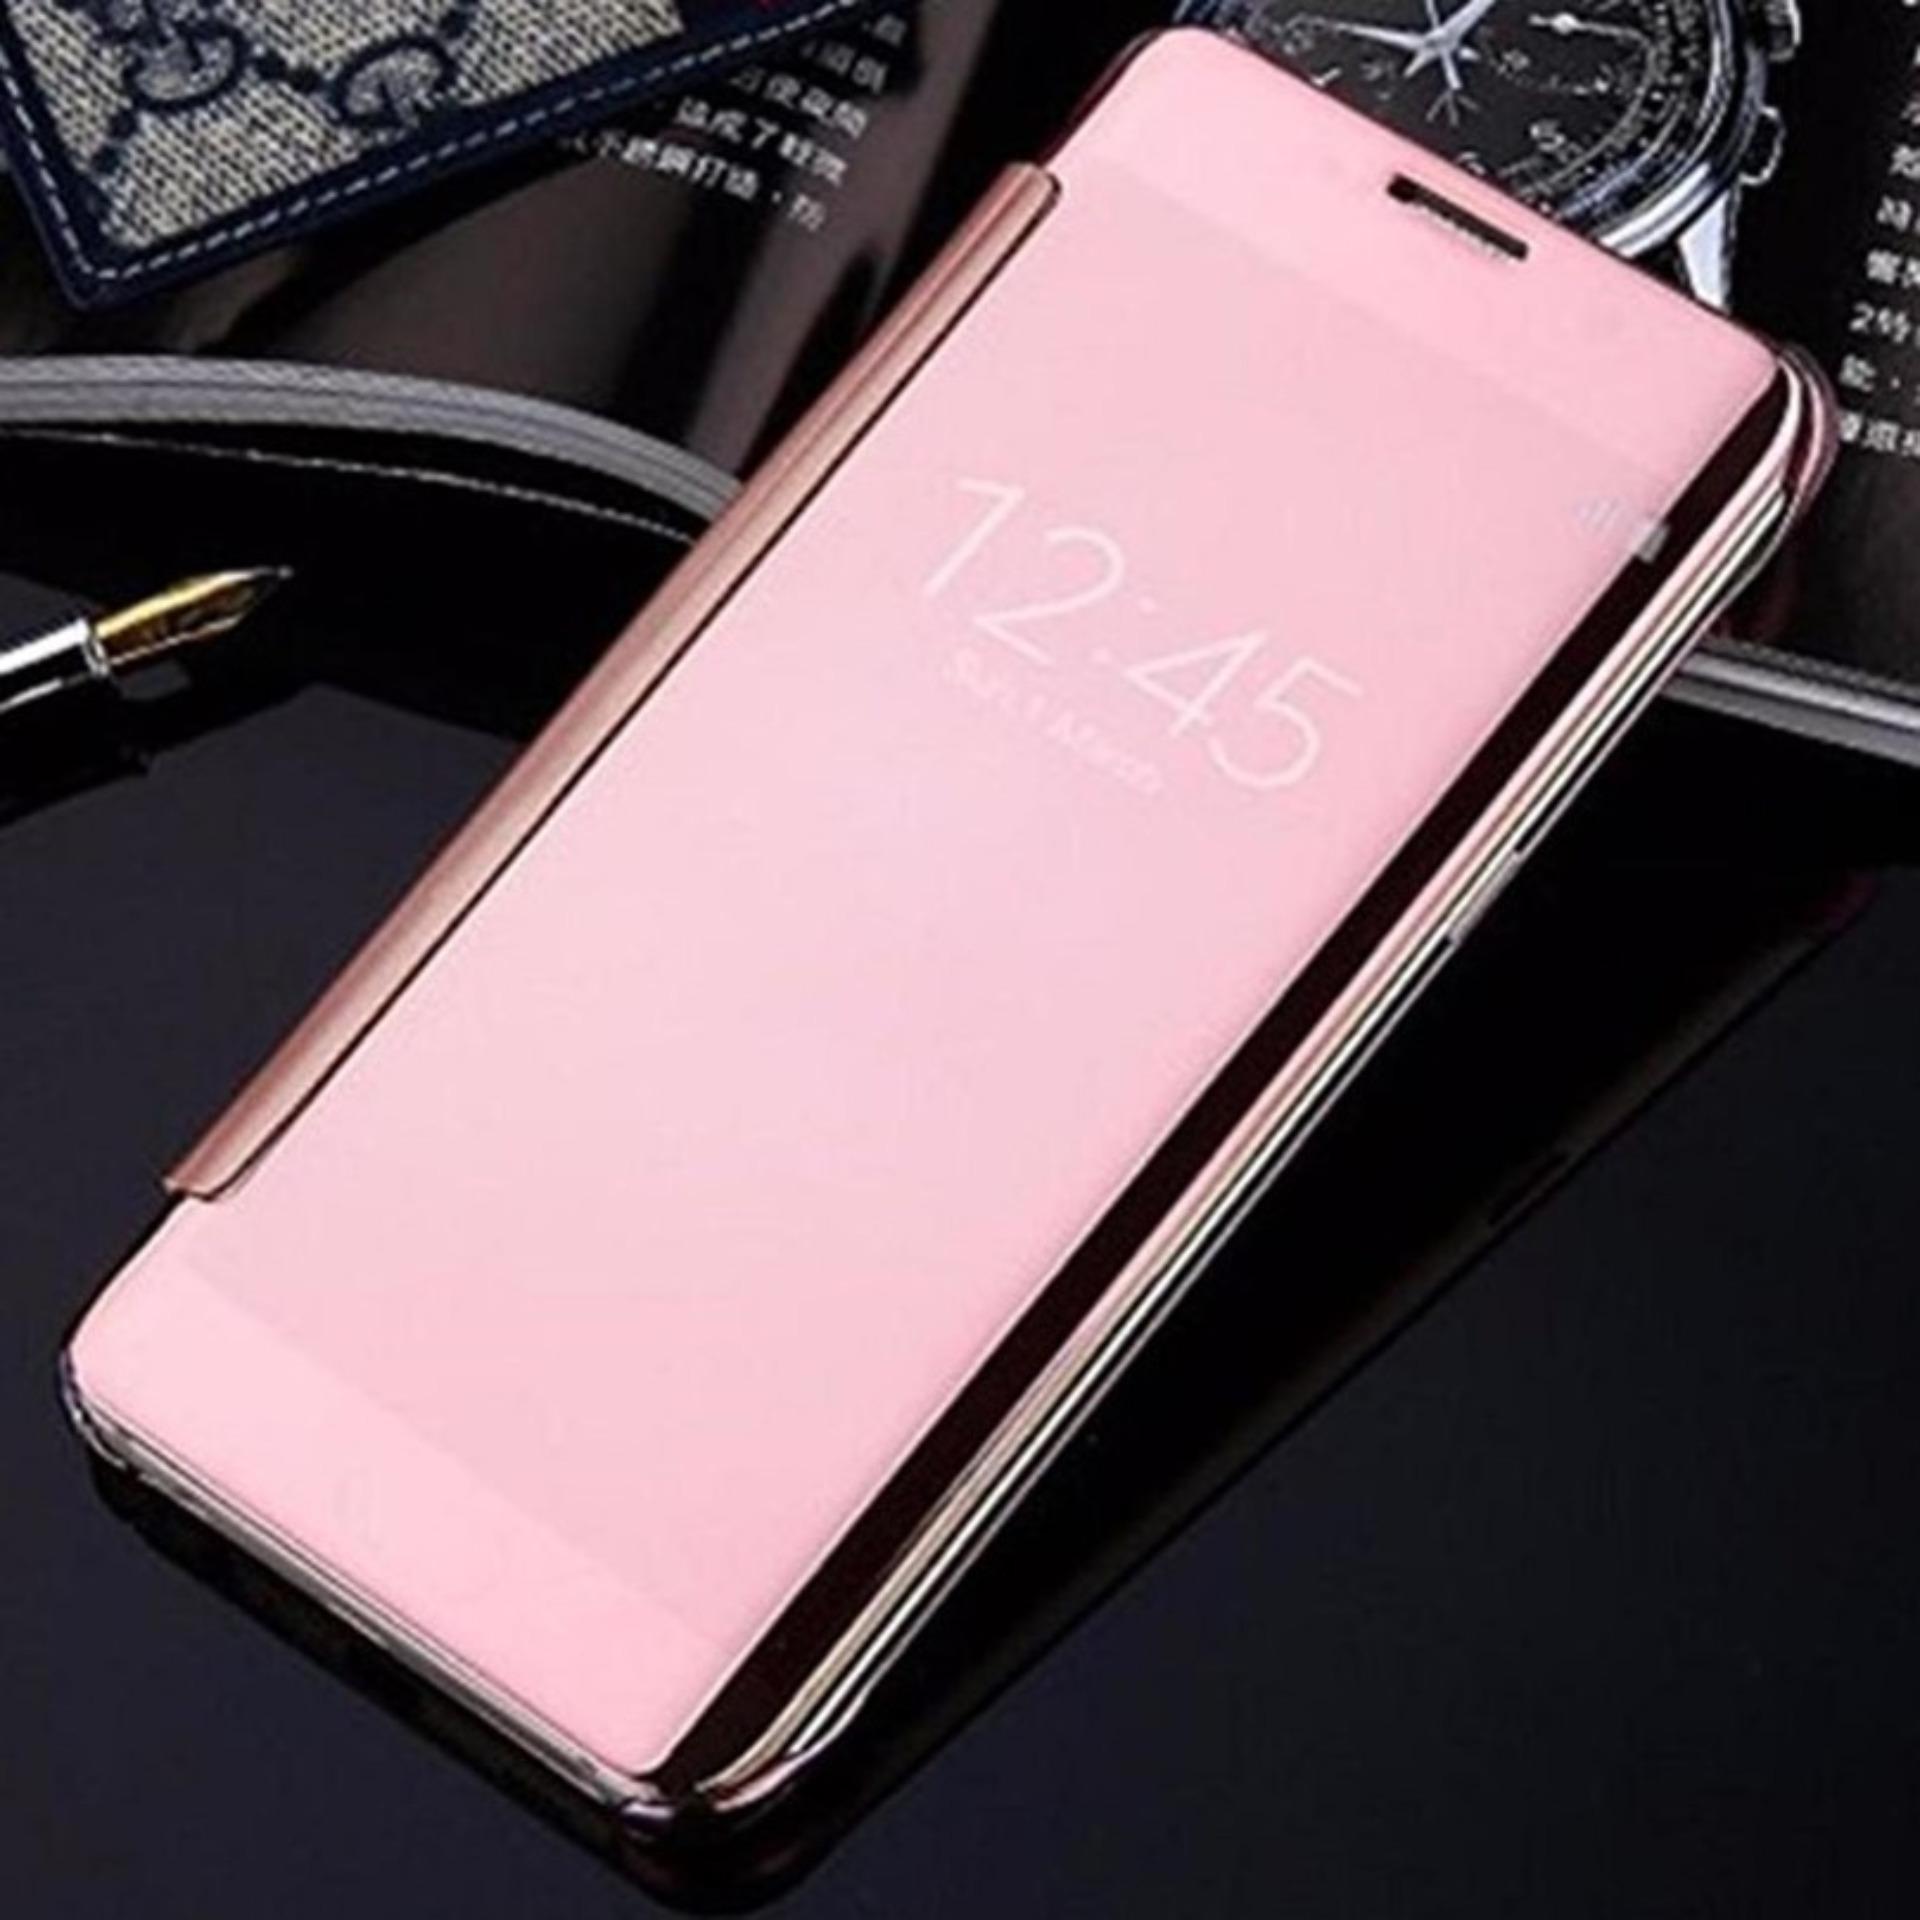 Harga Aquarium Nikita Size S Rp 50000 L Ukuran 40 X 25 28cm Flip Cover Original Standing Case Smart View Mirror Auto Lock Samsung Galaxy Note 8 Gold